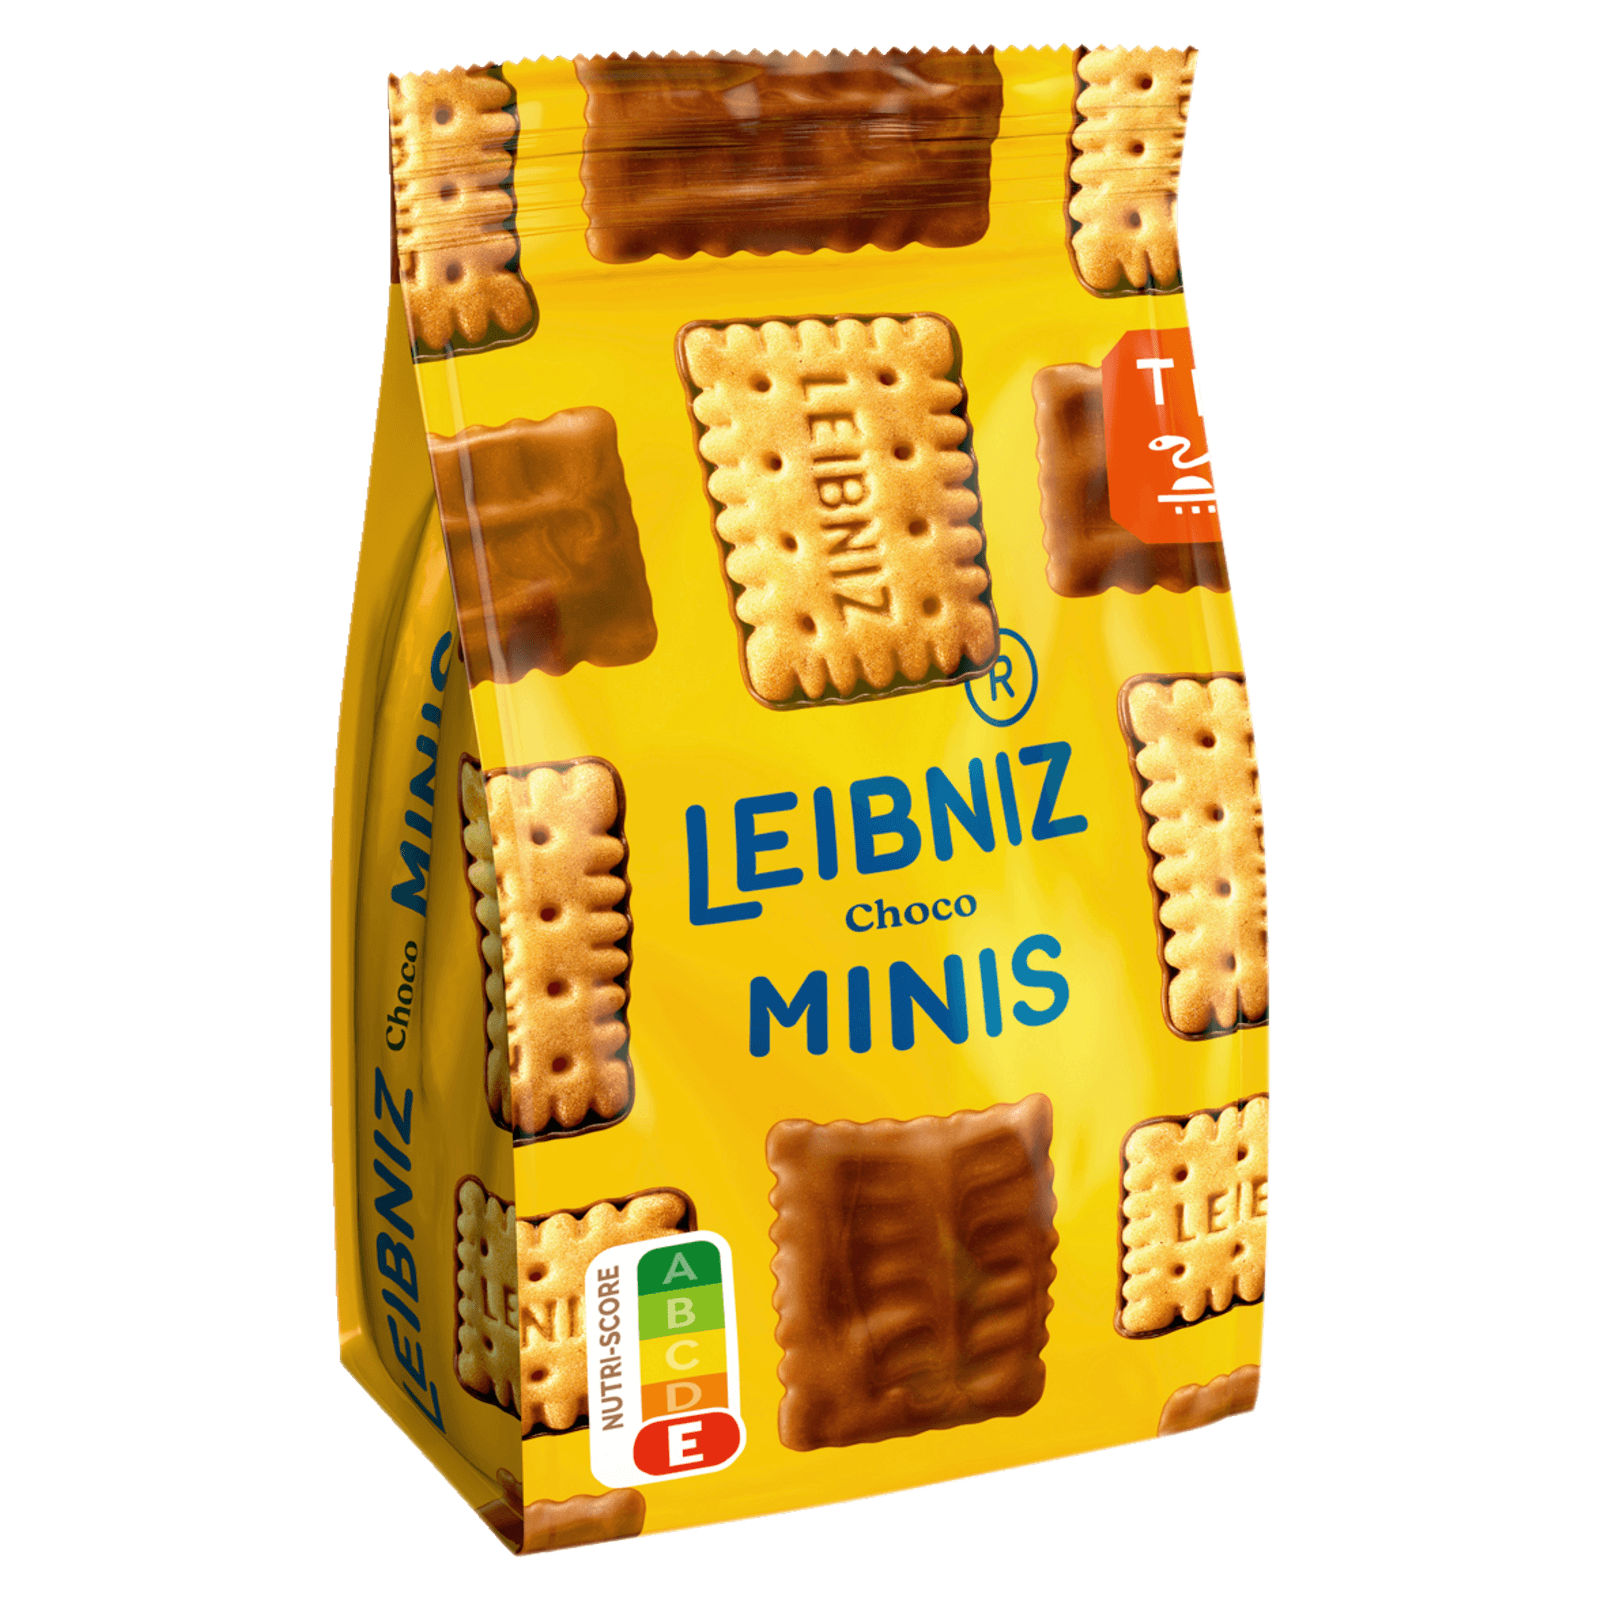 Leibniz Minis Choco 125g